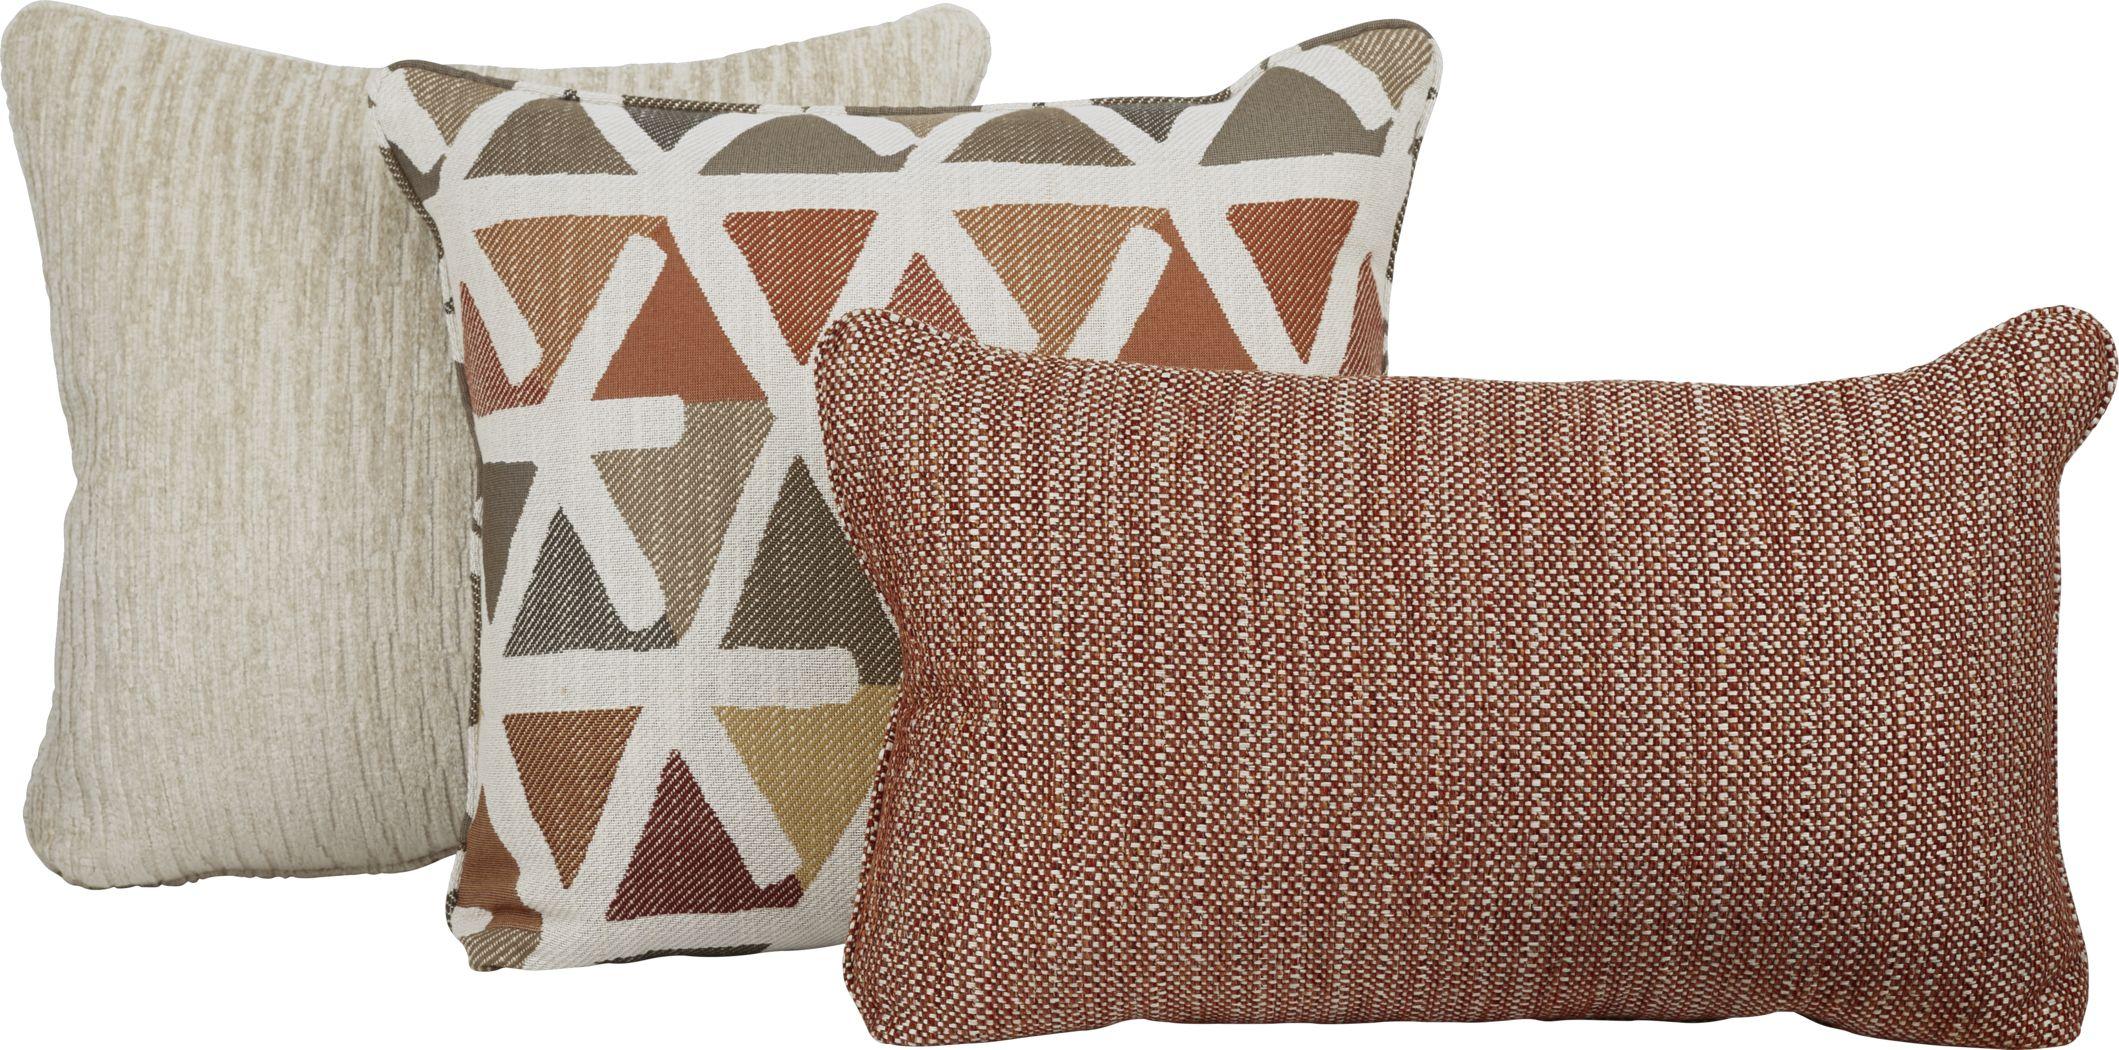 Cortex Sienna 6 Pc Pillow Package